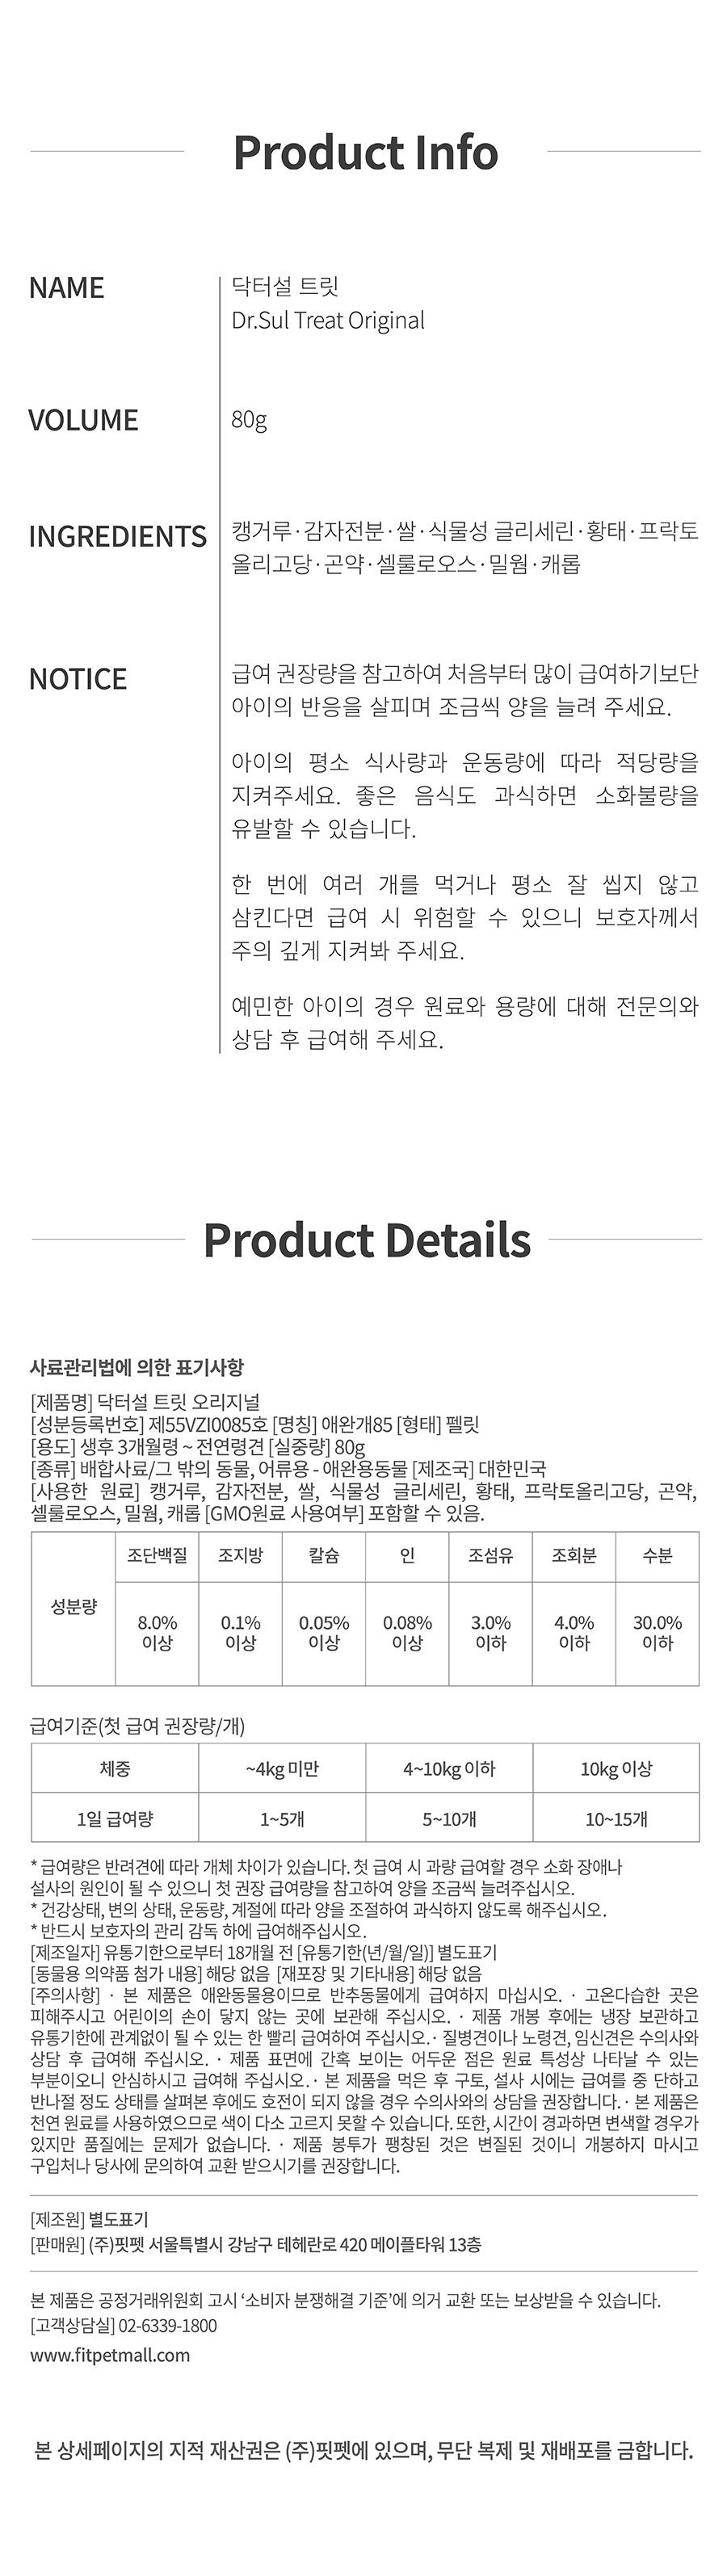 [EVENT] 닥터설 트릿-상품이미지-9